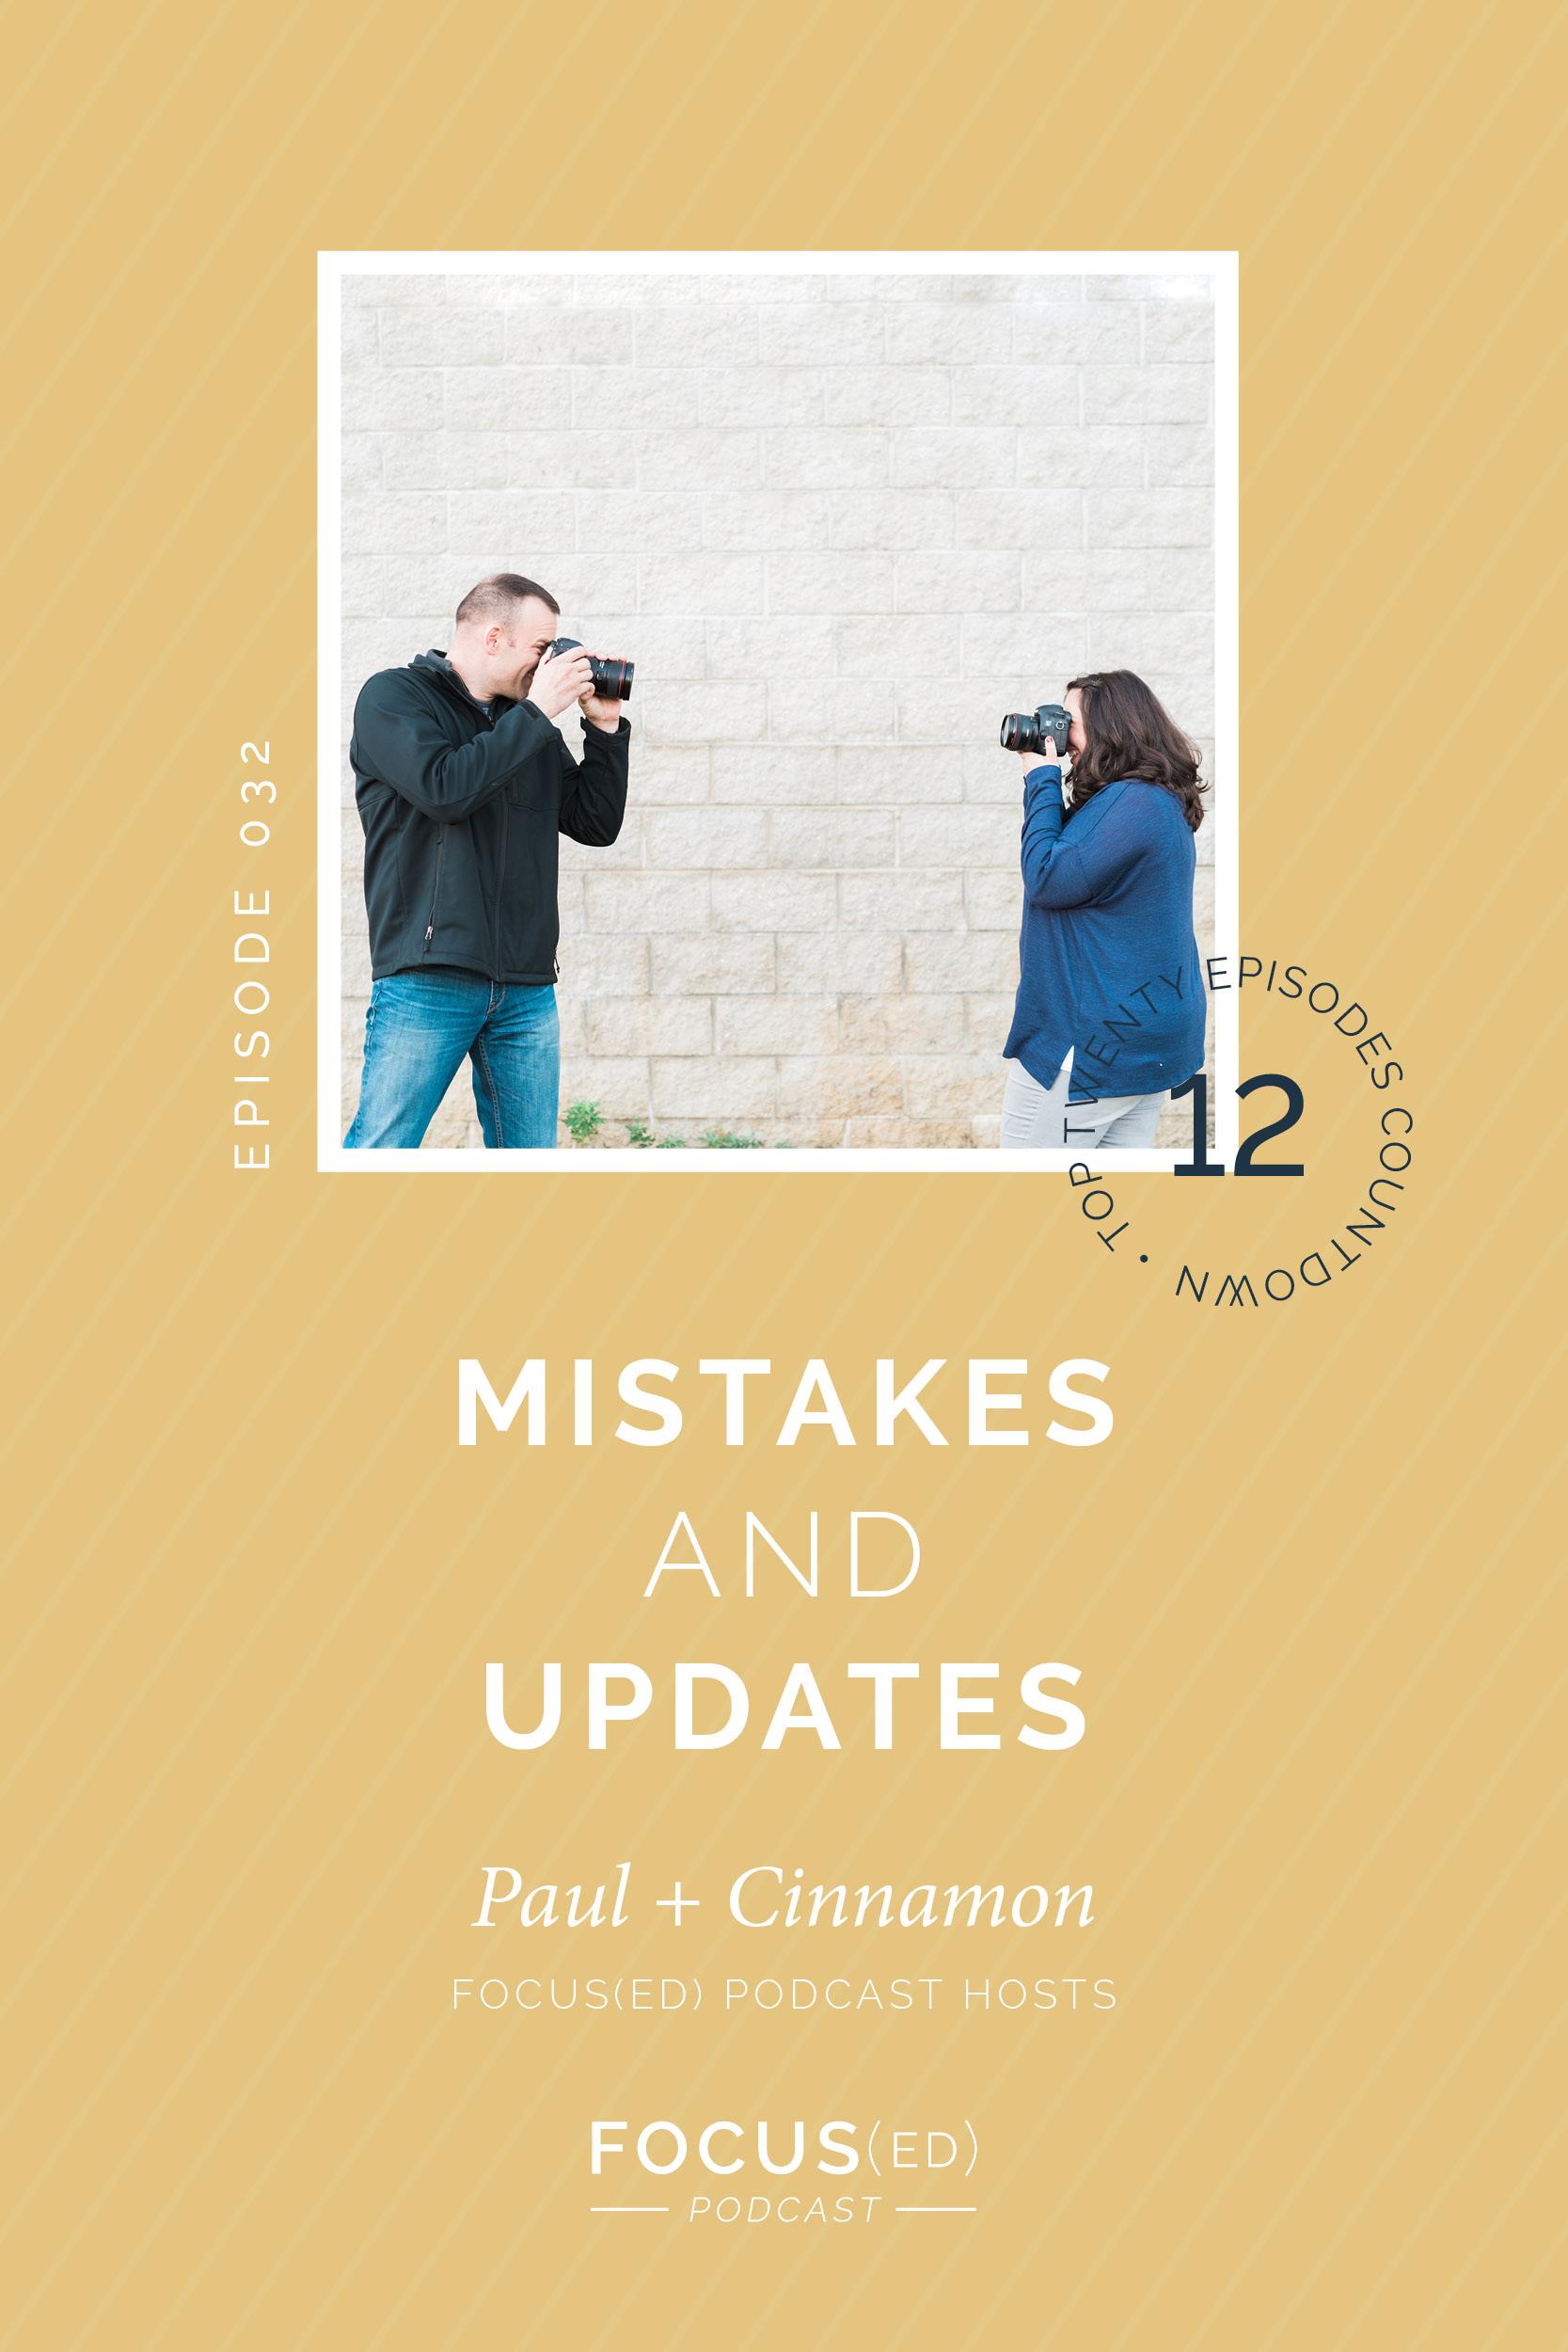 Top 20: #12 Mistakes & Updates, Paul & Cinnamon   Focus(ed) Podcast